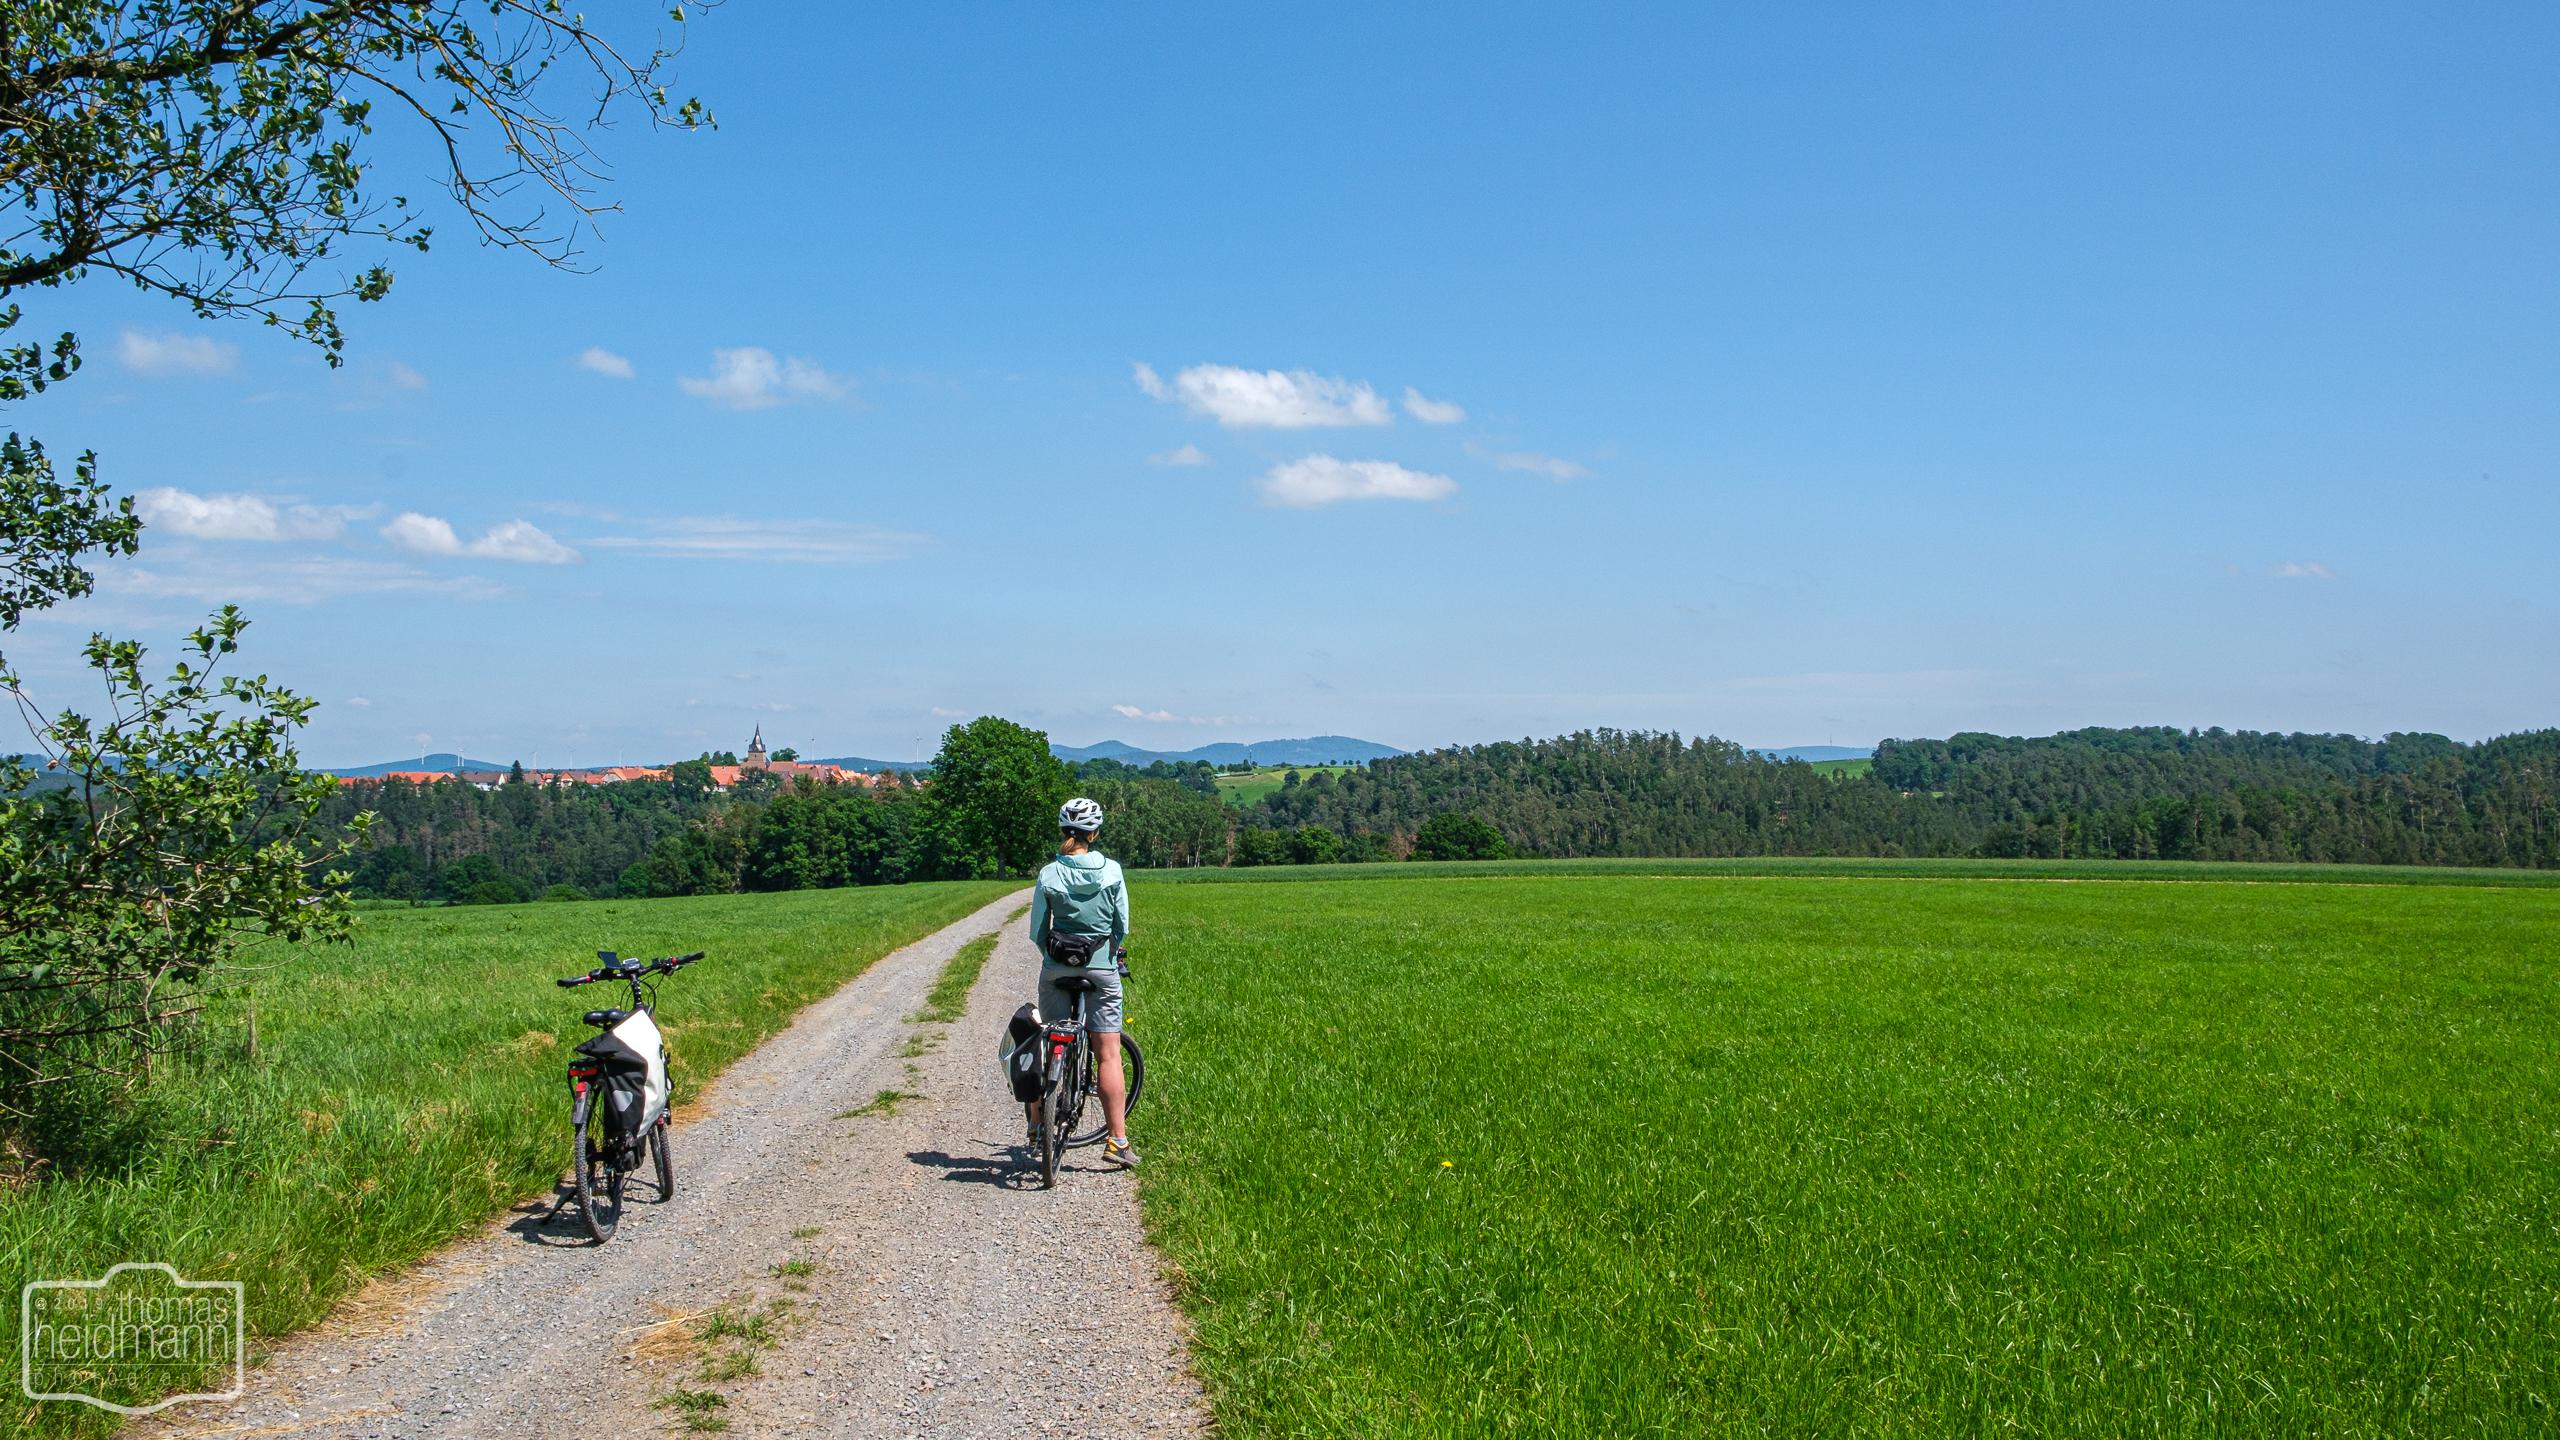 Radtour am Twistesee bei Bad Arolsen